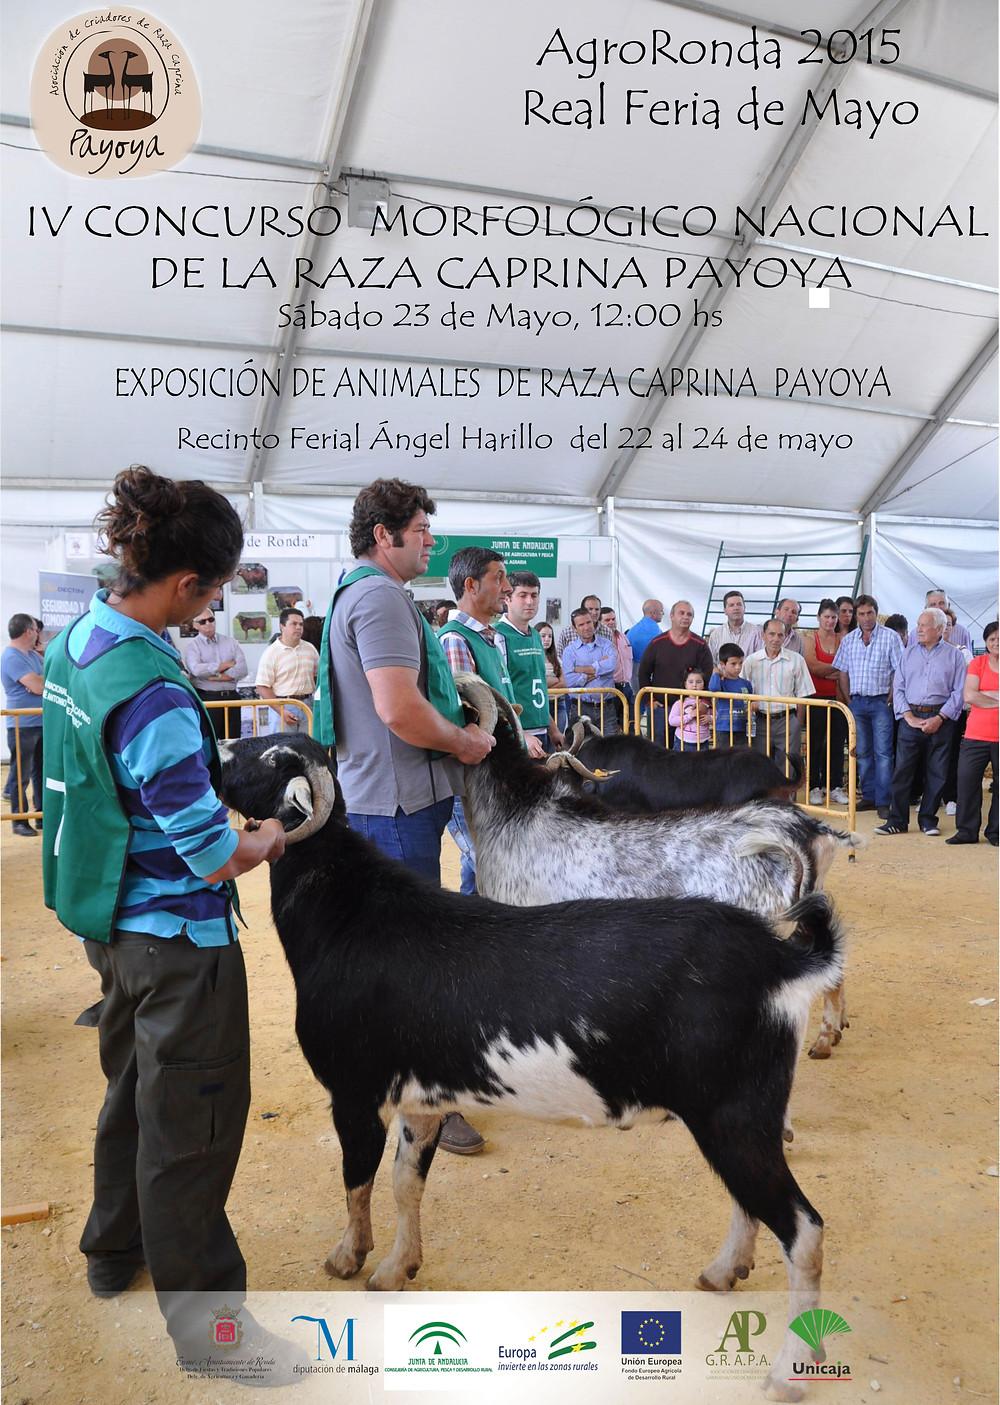 cartel-concurso-morfologico-payoya-2015-2.jpg